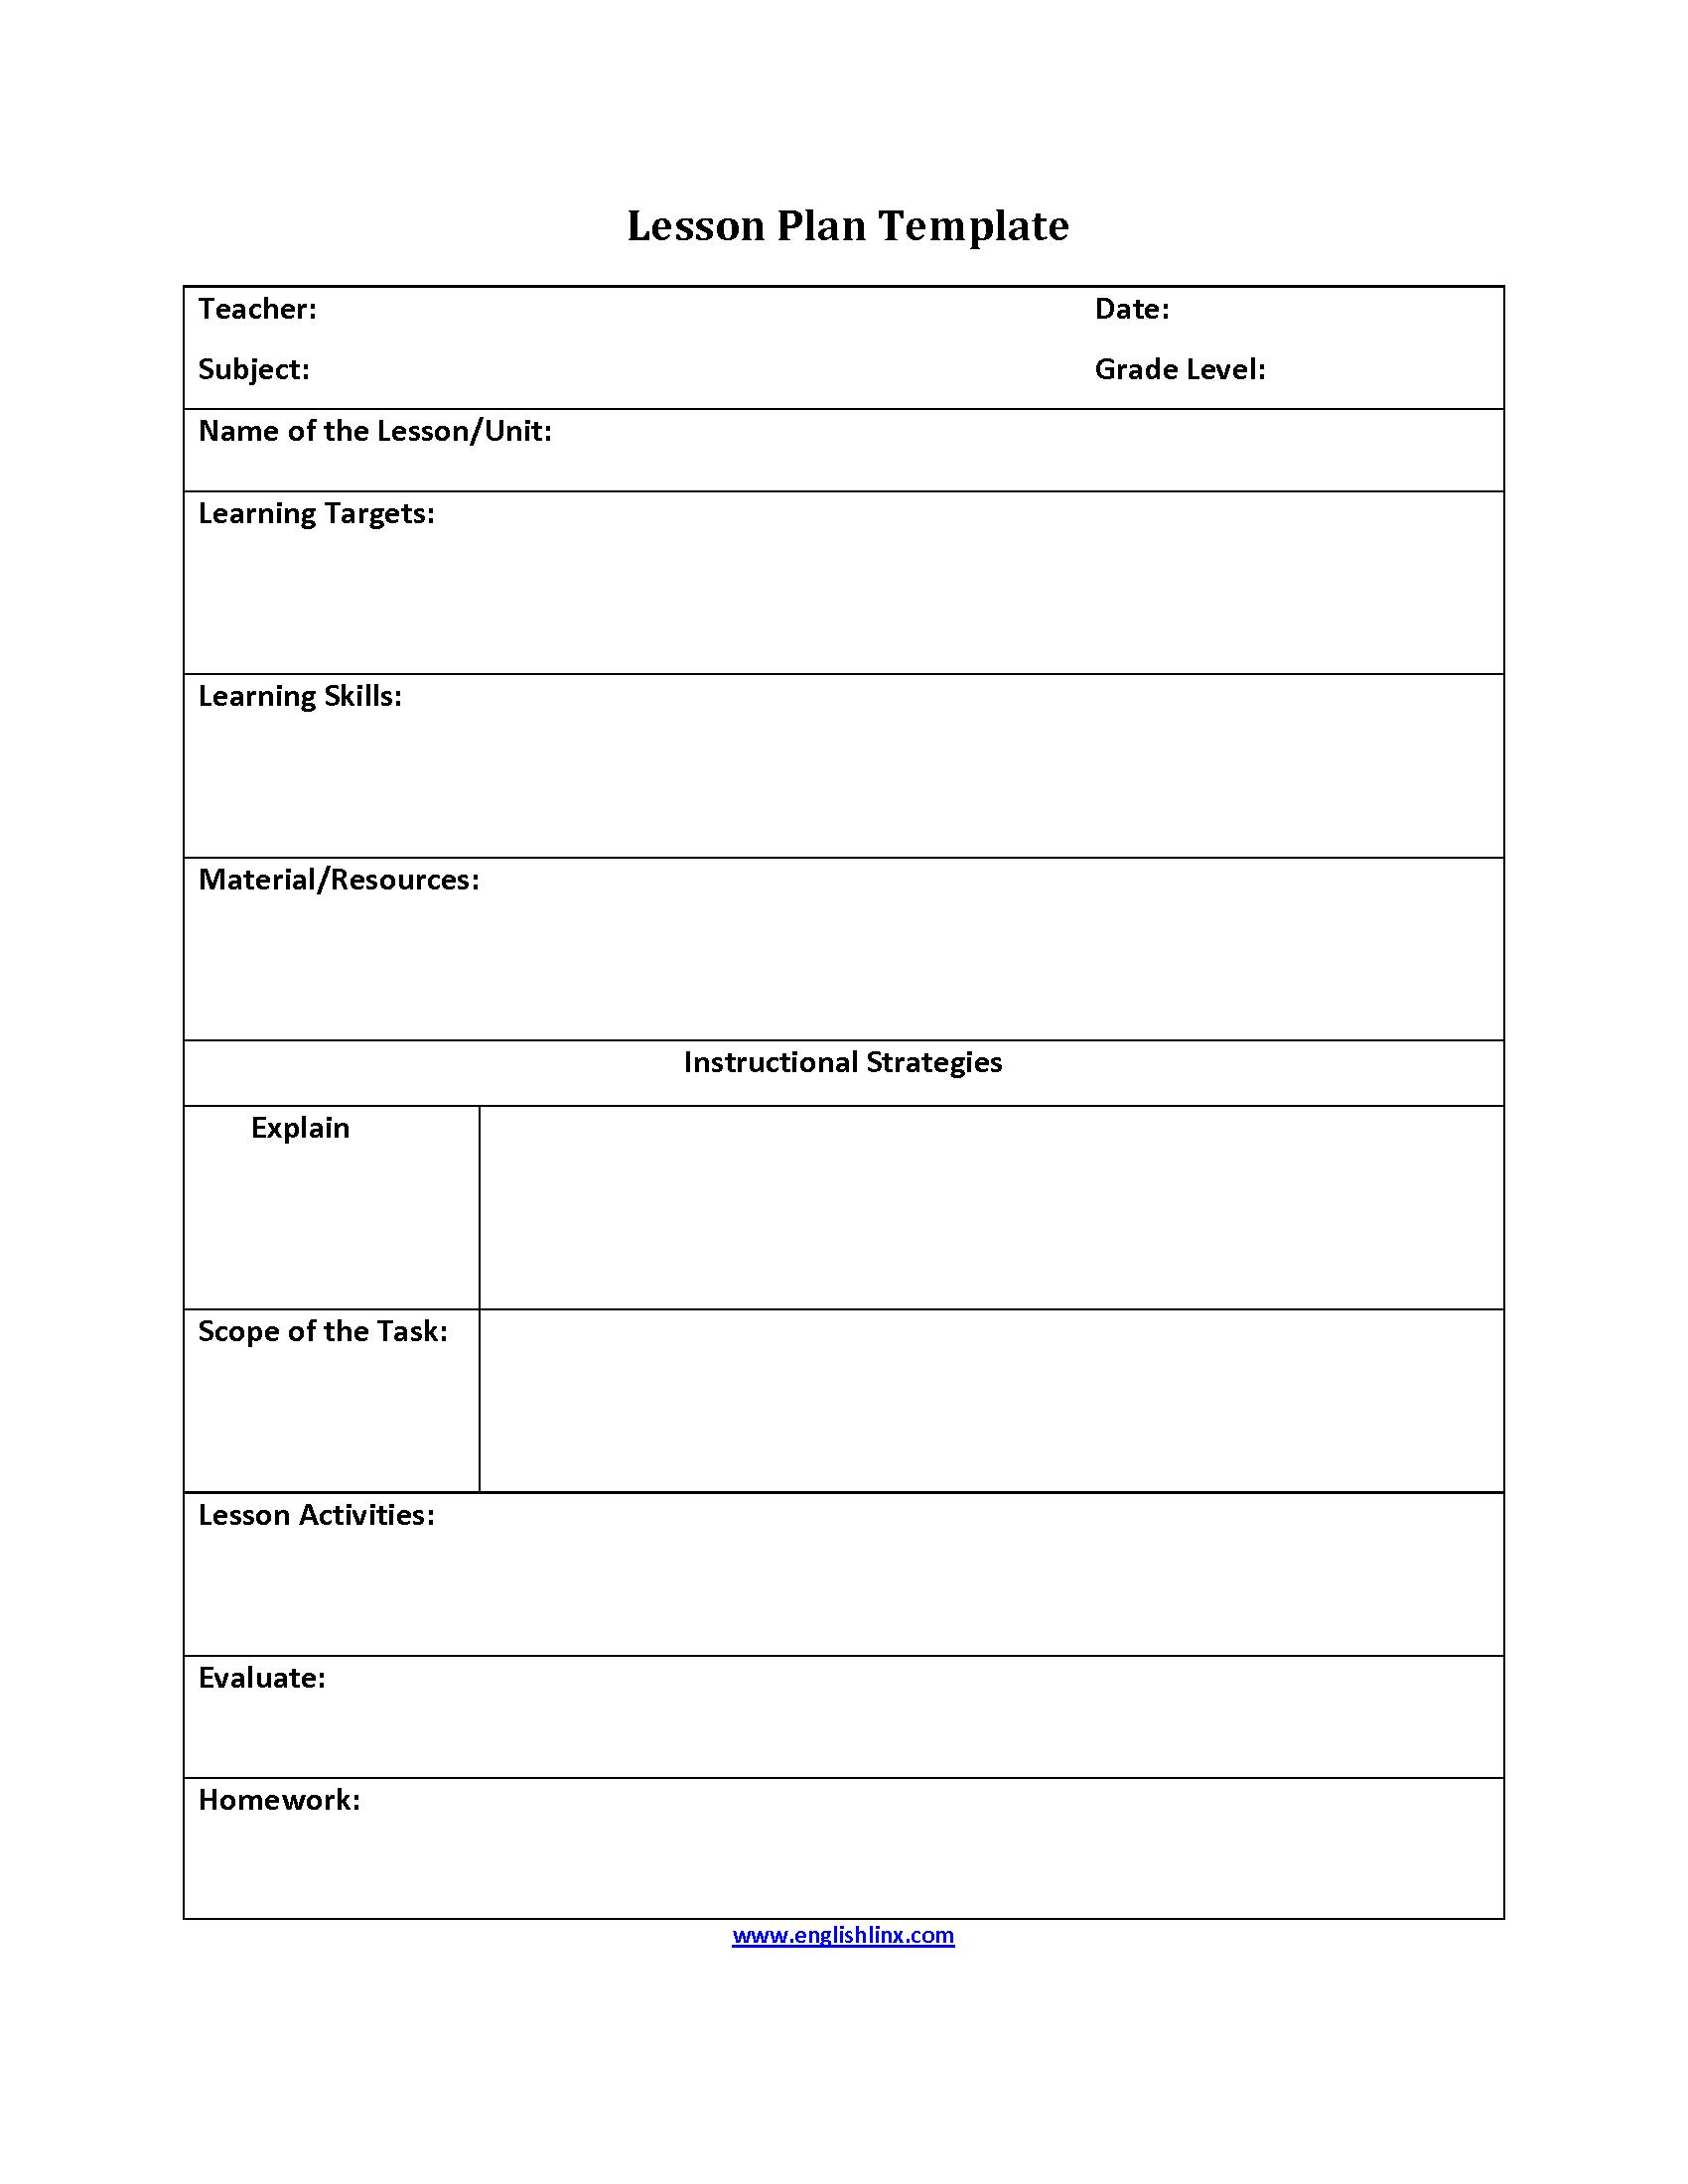 hight resolution of Englishlinx.com   Lesson Plan Template